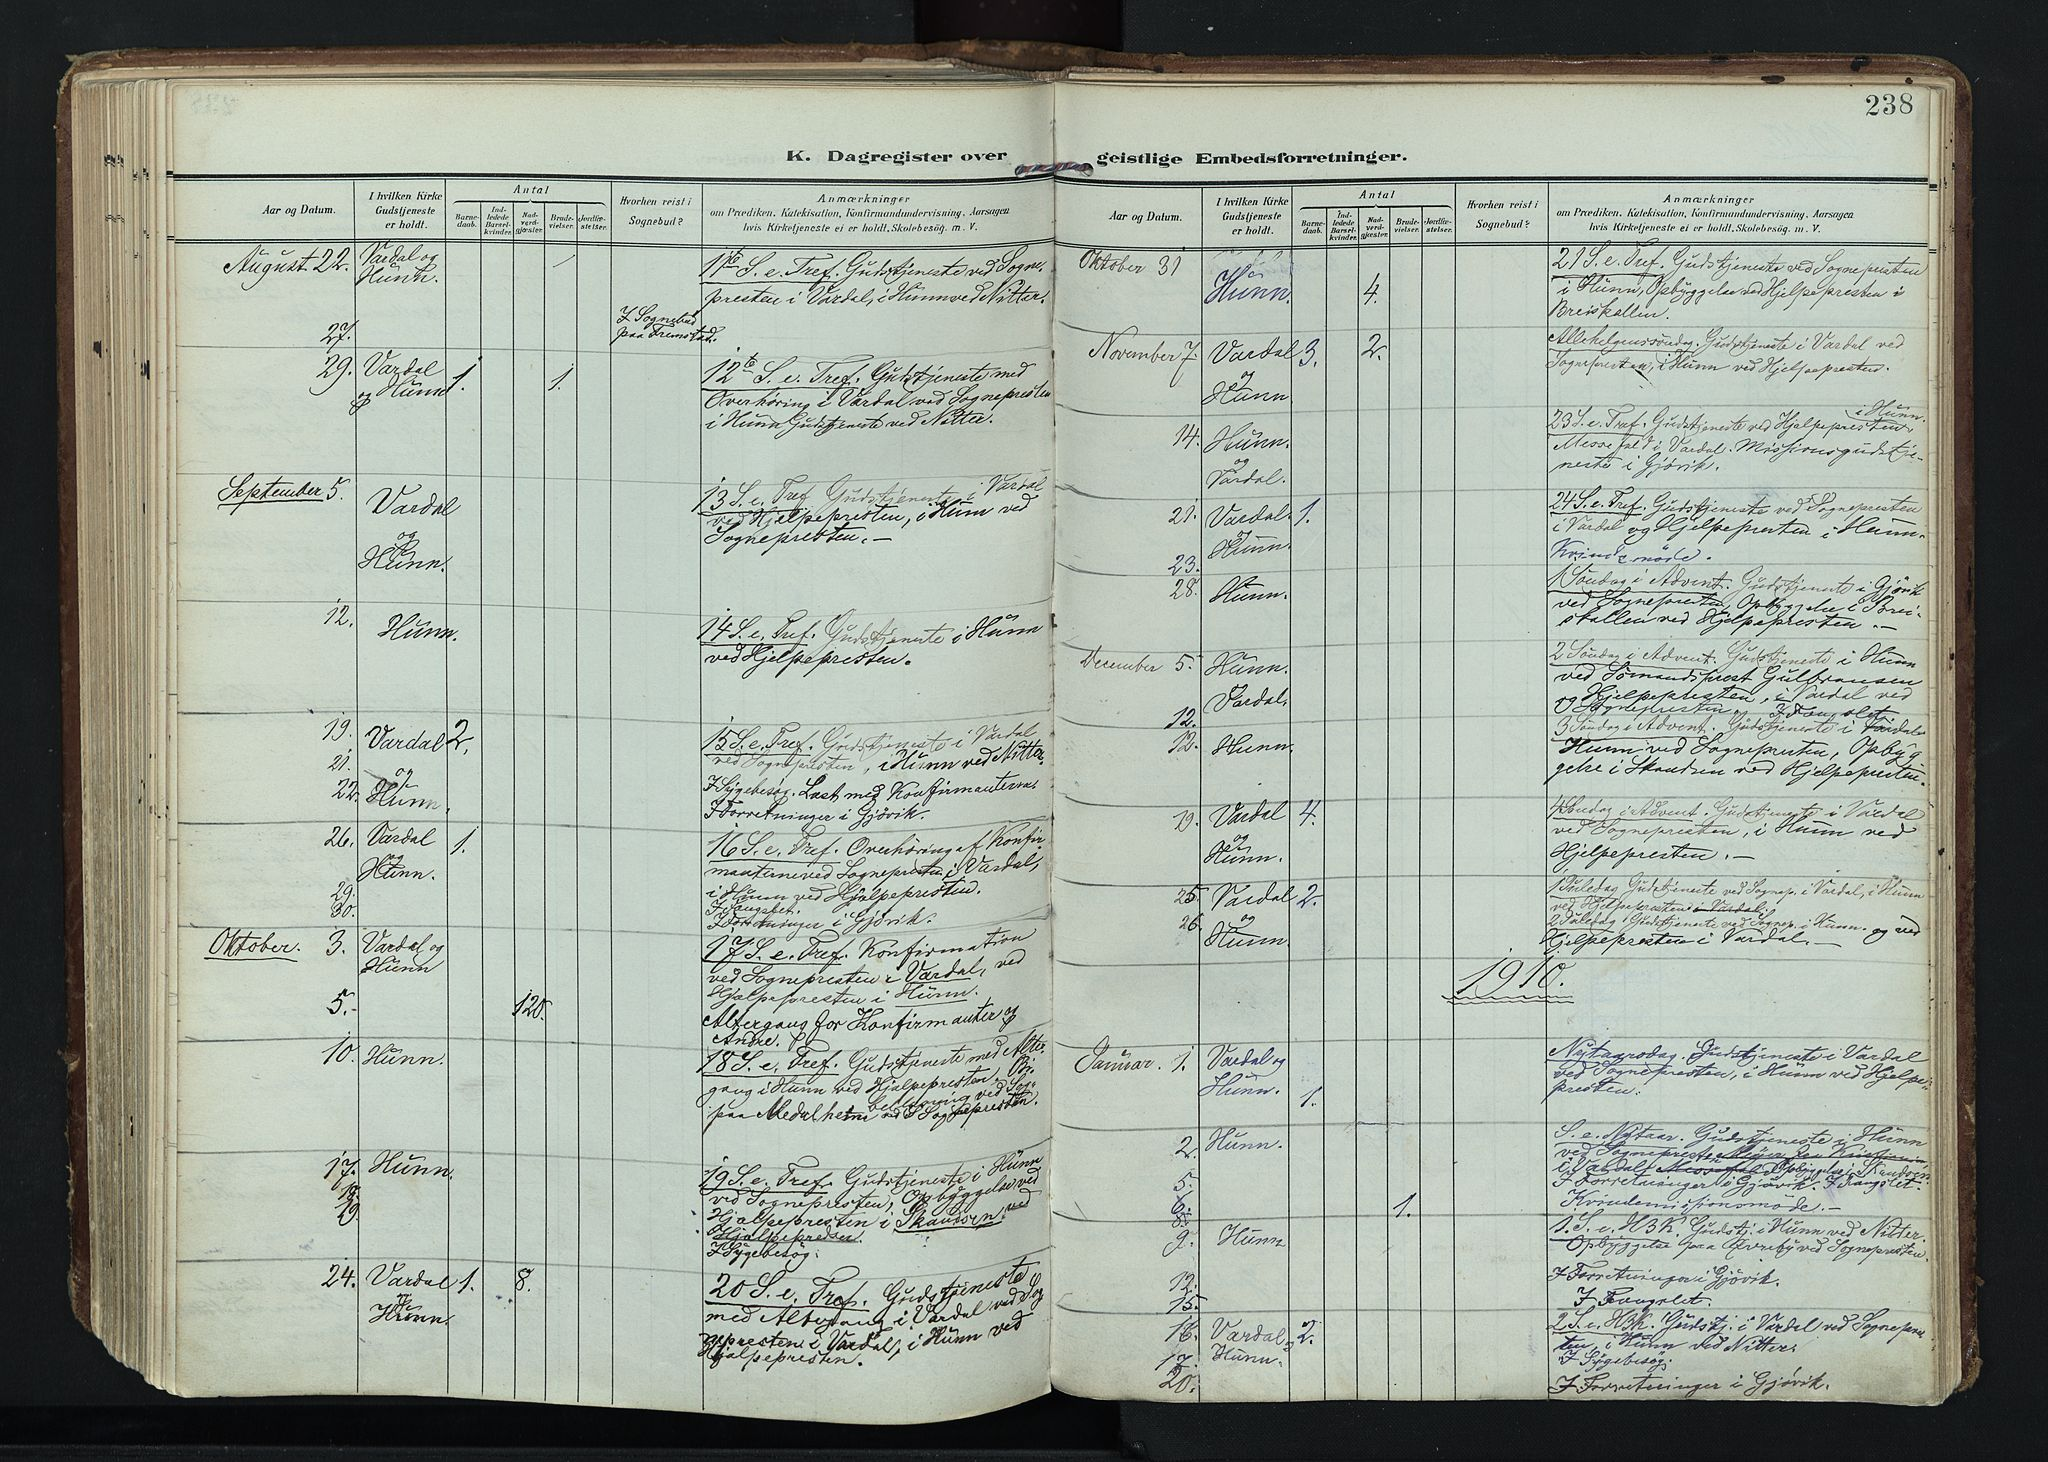 SAH, Vardal prestekontor, H/Ha/Haa/L0020: Ministerialbok nr. 20, 1907-1921, s. 238